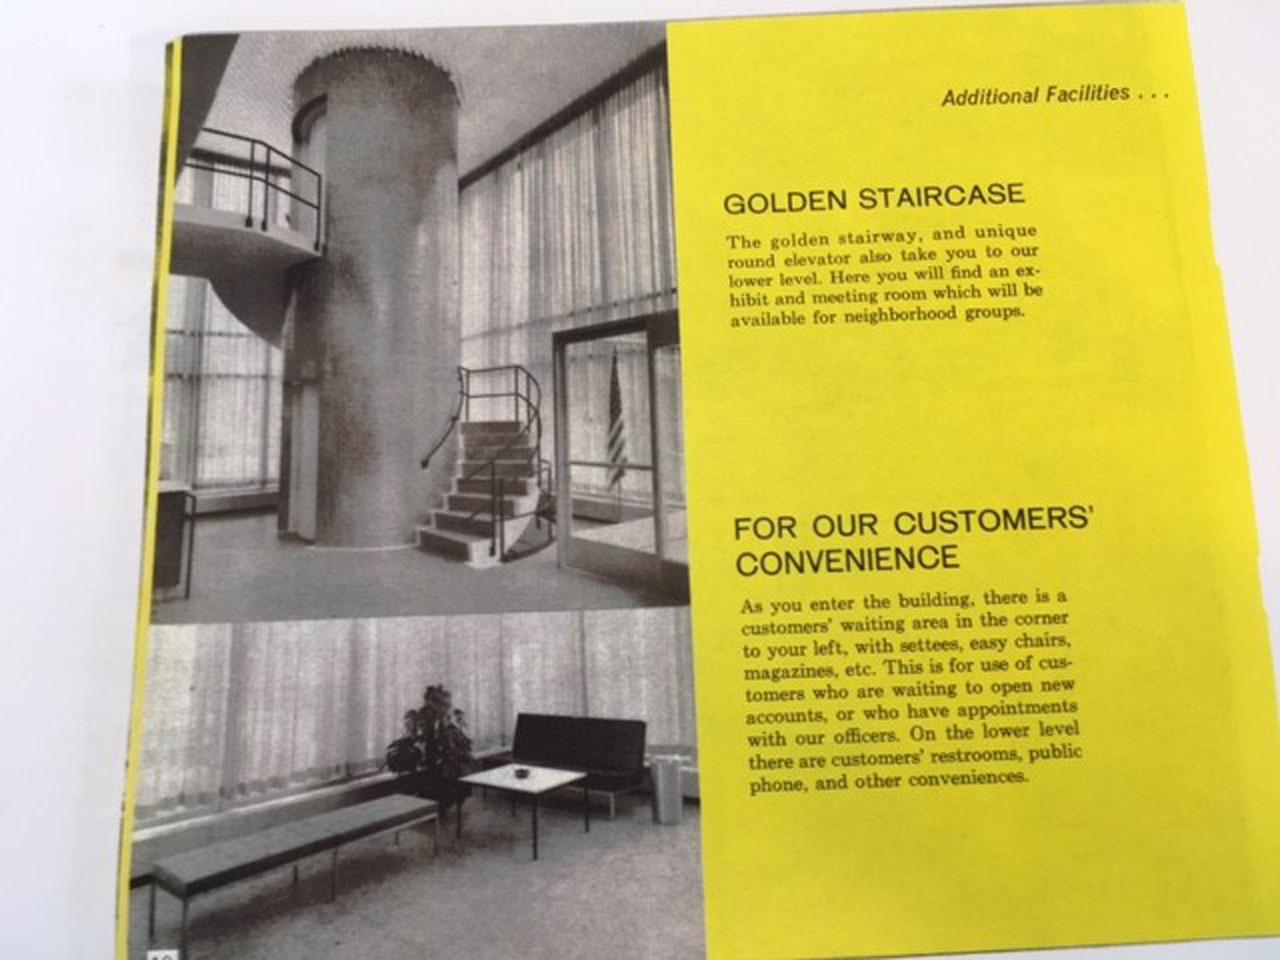 The original North Federal Savings brochure